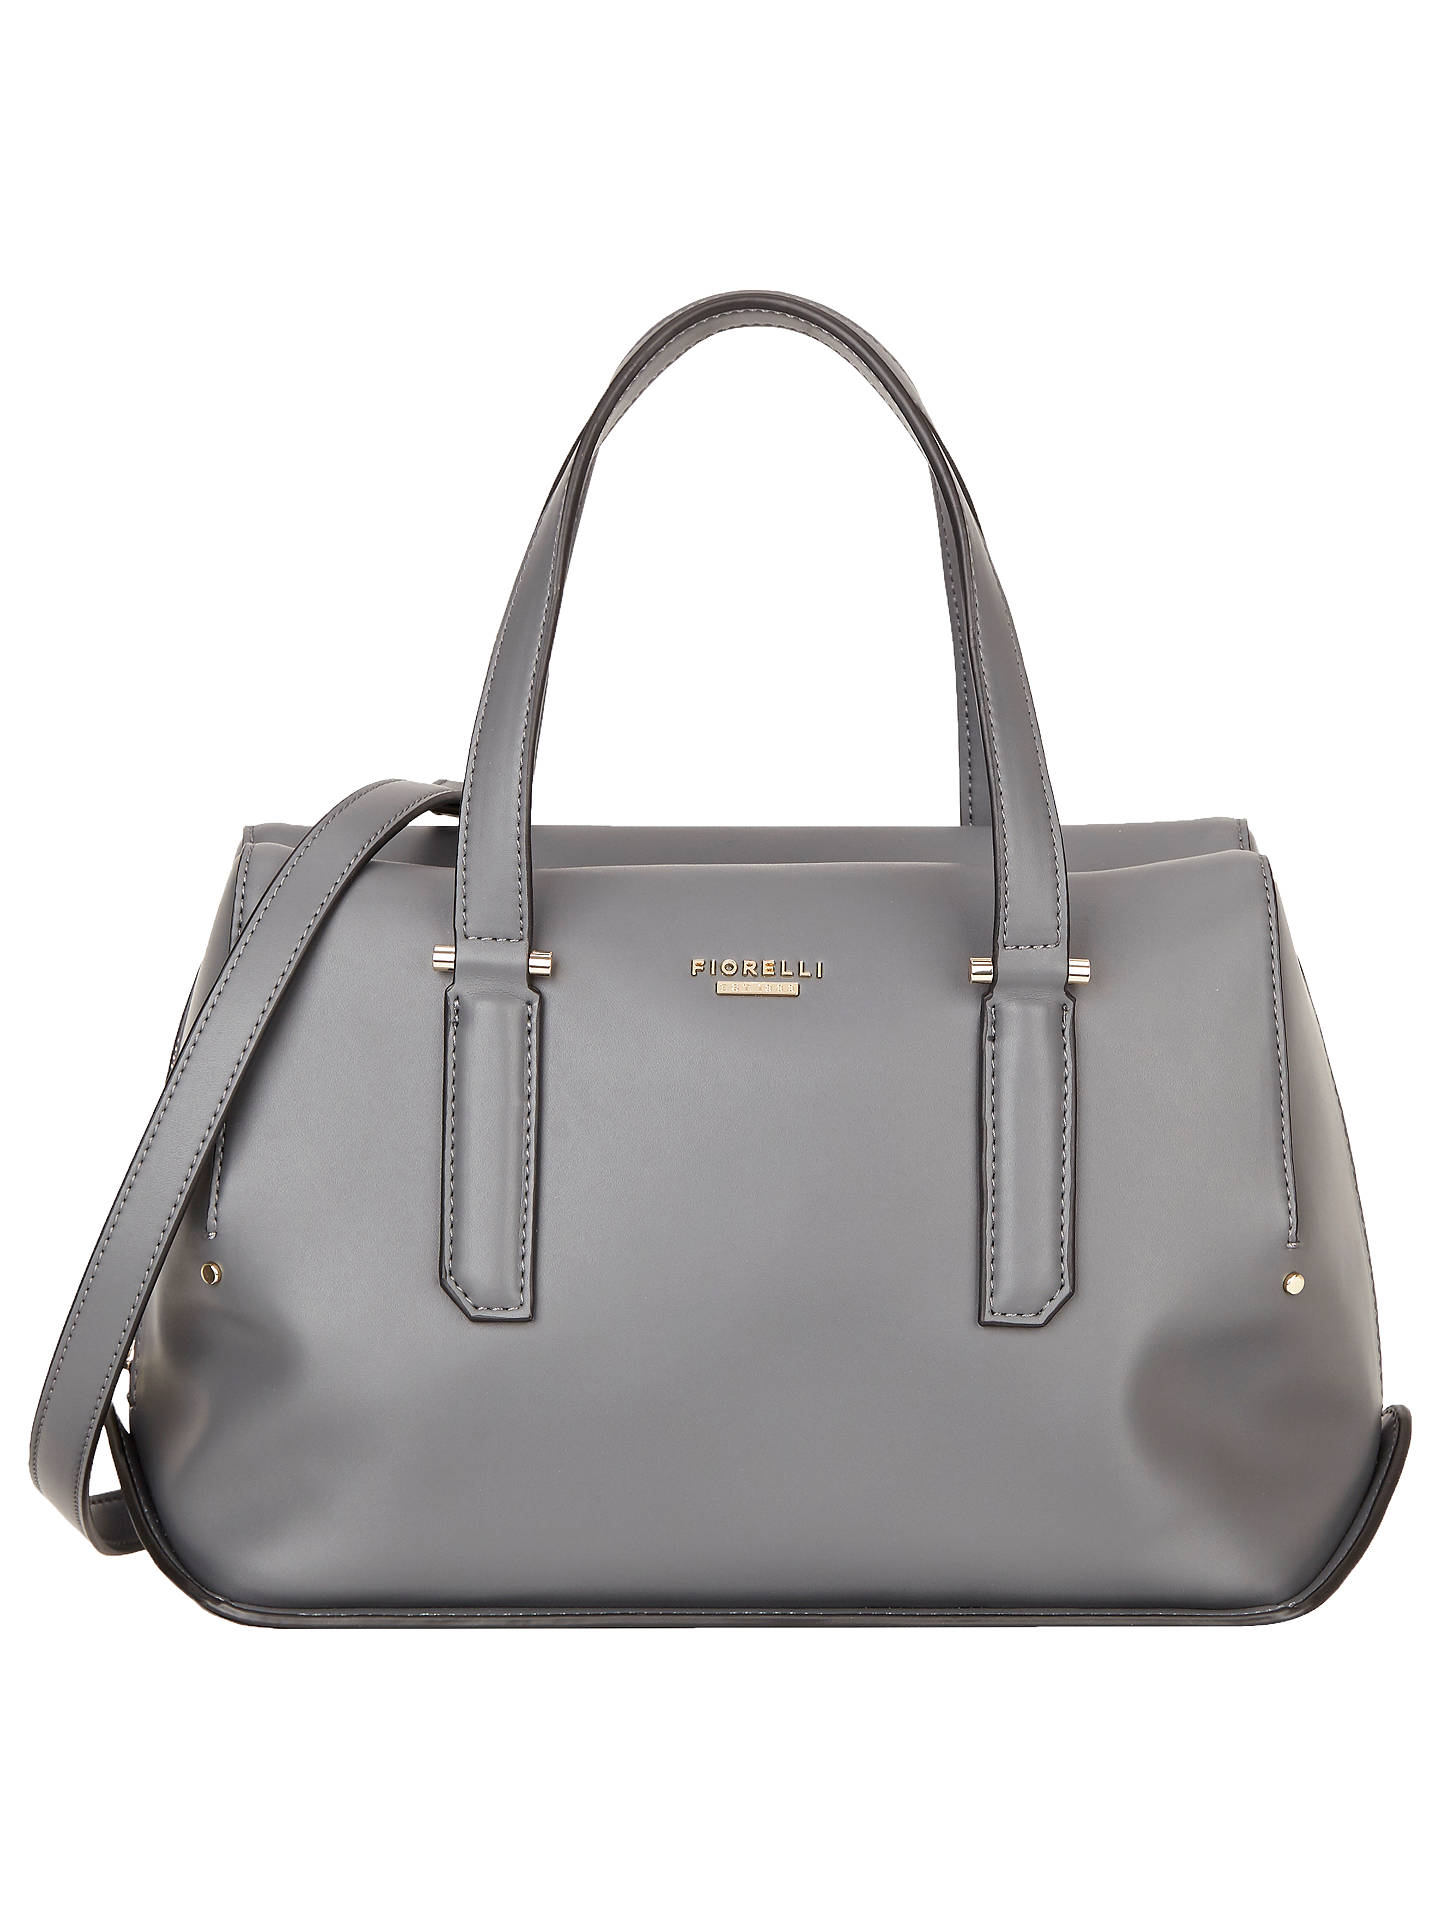 9c749efc05 Fiorelli Celia Bowler Bag at John Lewis   Partners